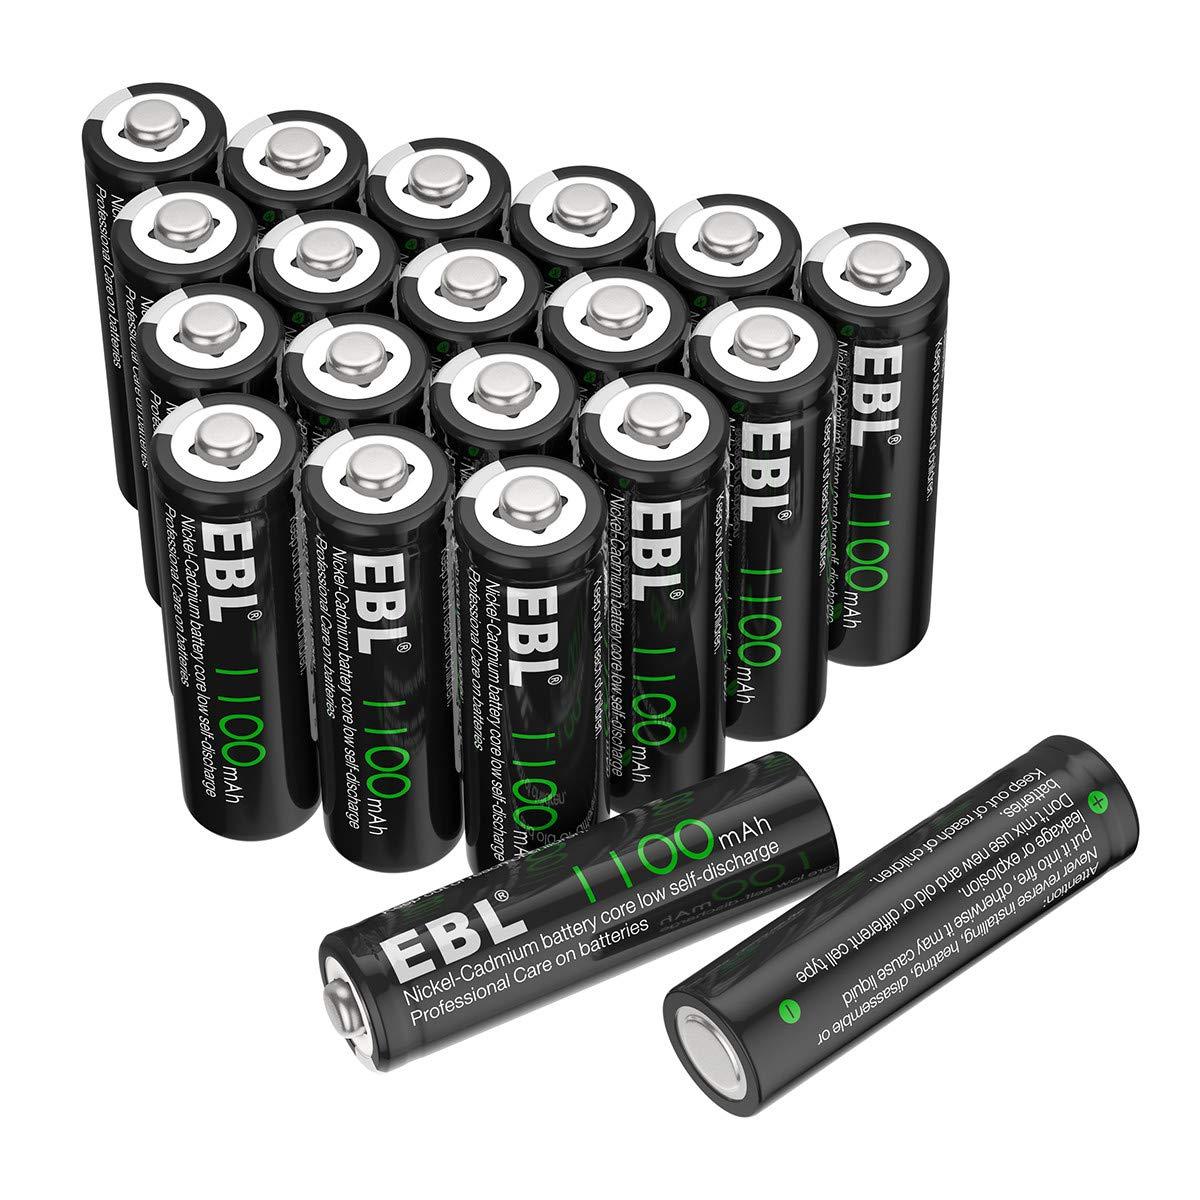 EBL AA Rechargeable Batteries 20